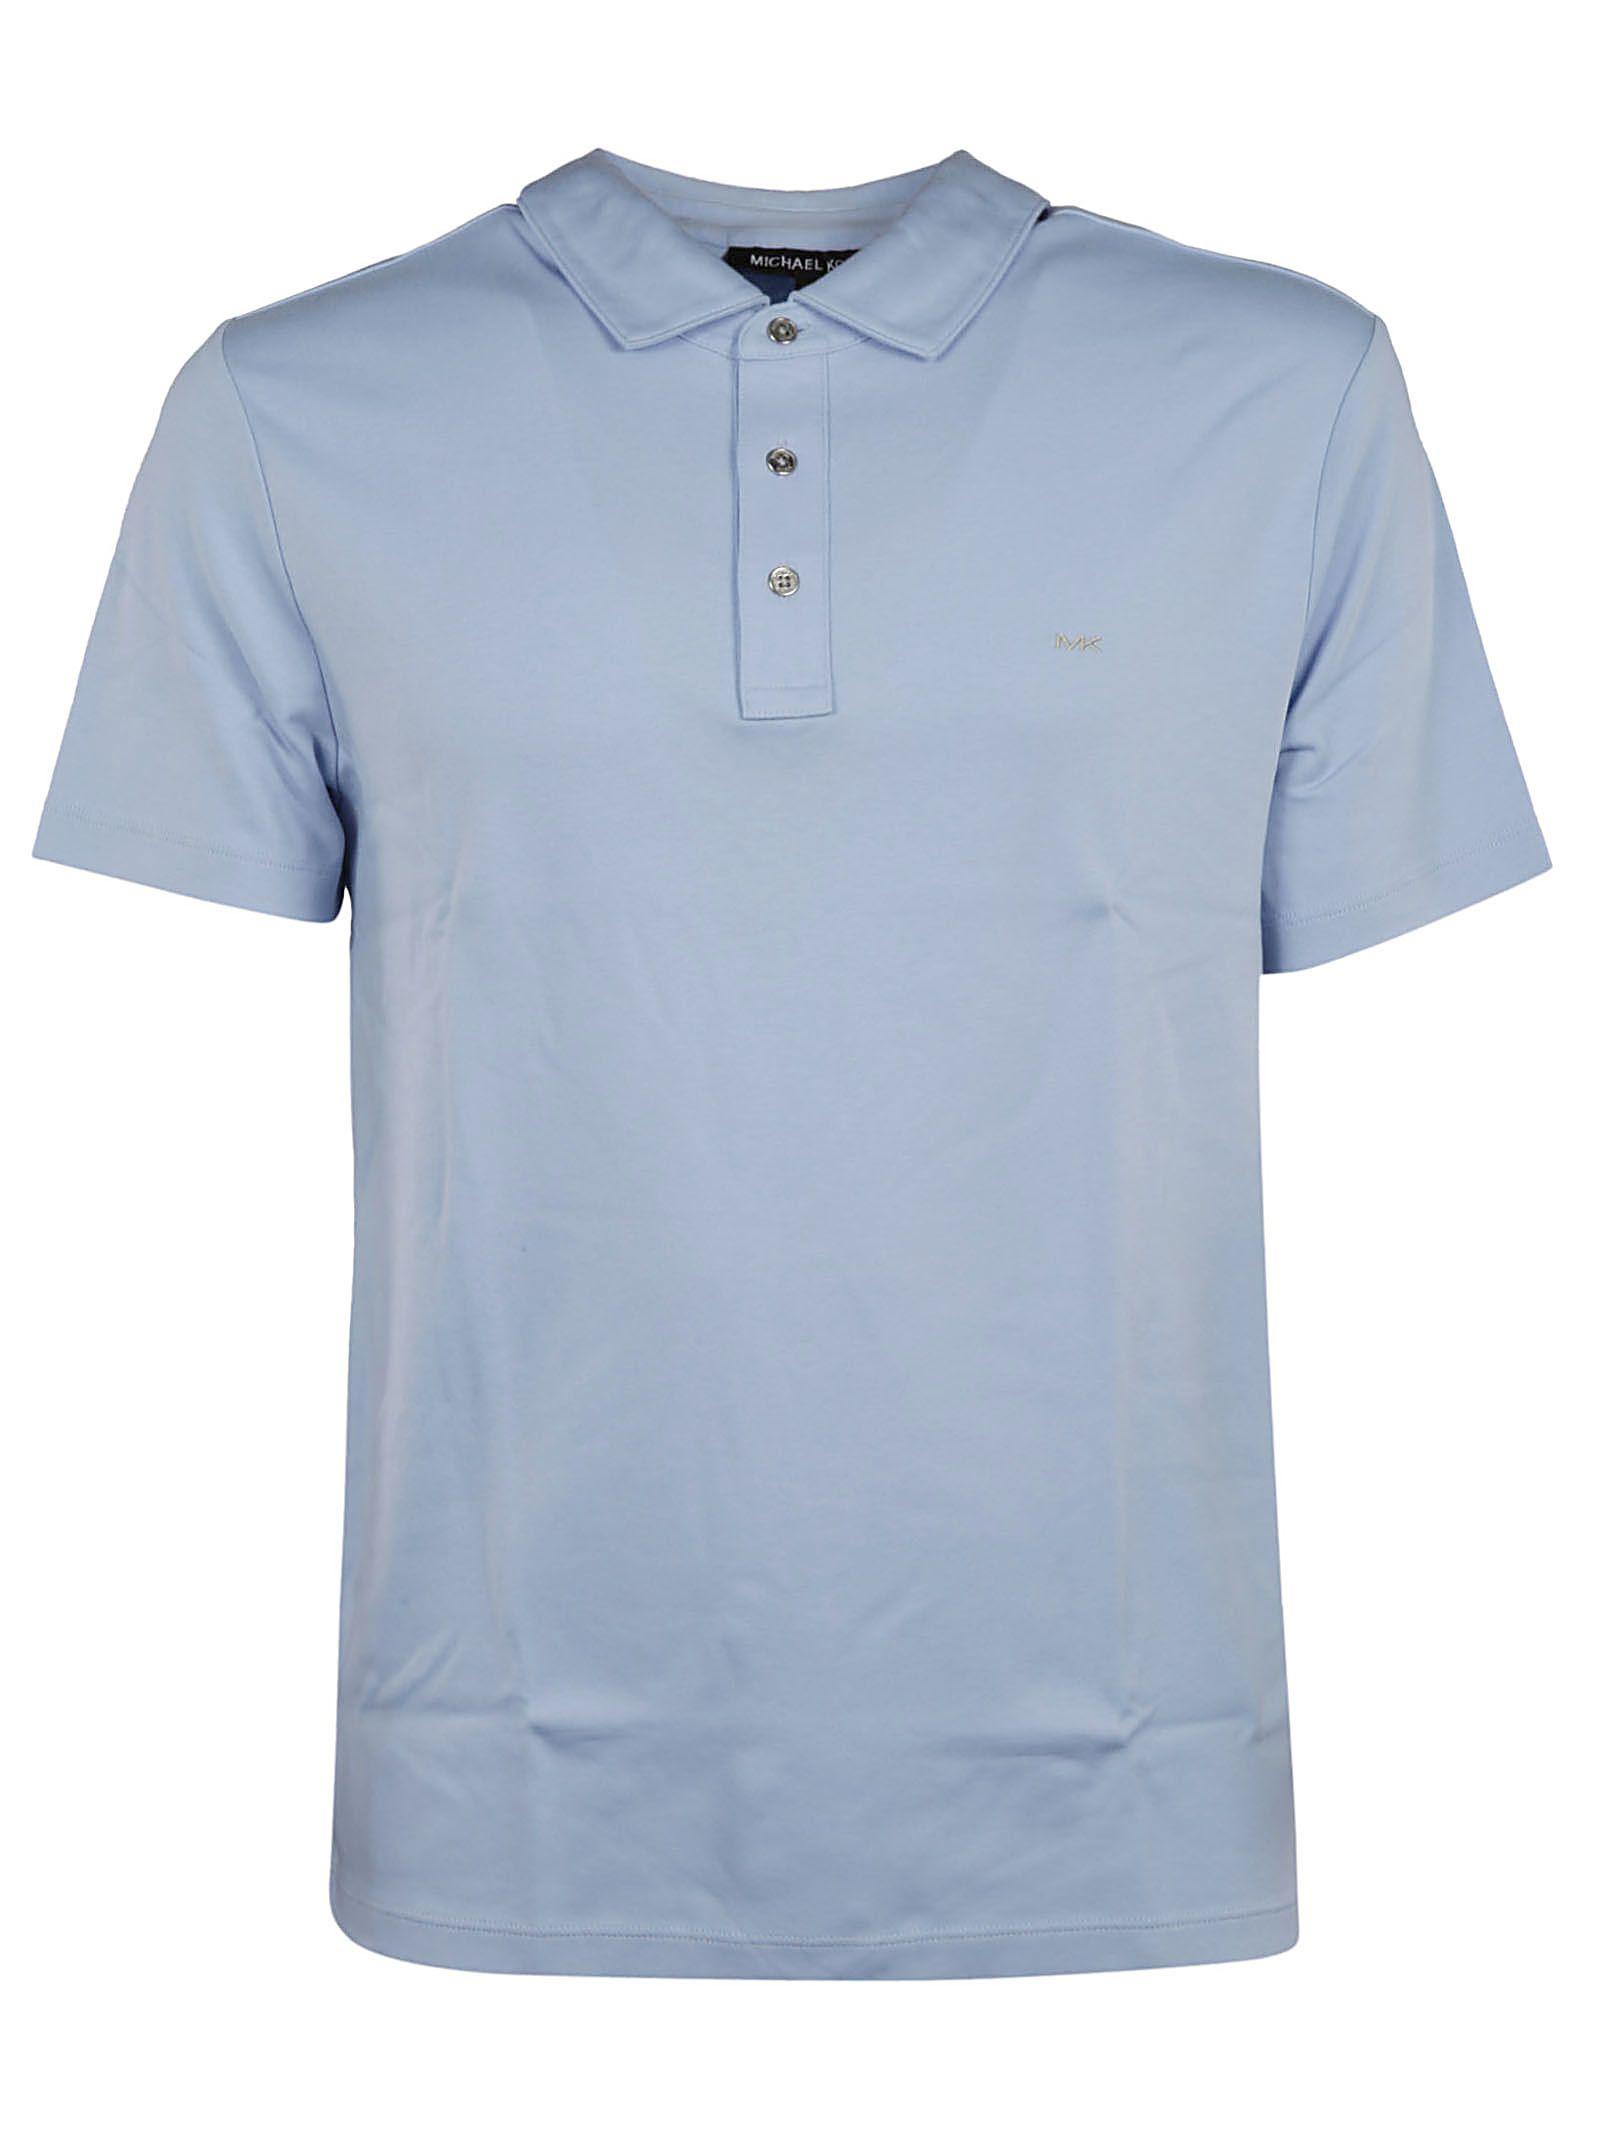 d17b2d5c Michael Kors Michael Kors Classic Polo Shirt - Steel Blue - 10855324 ...